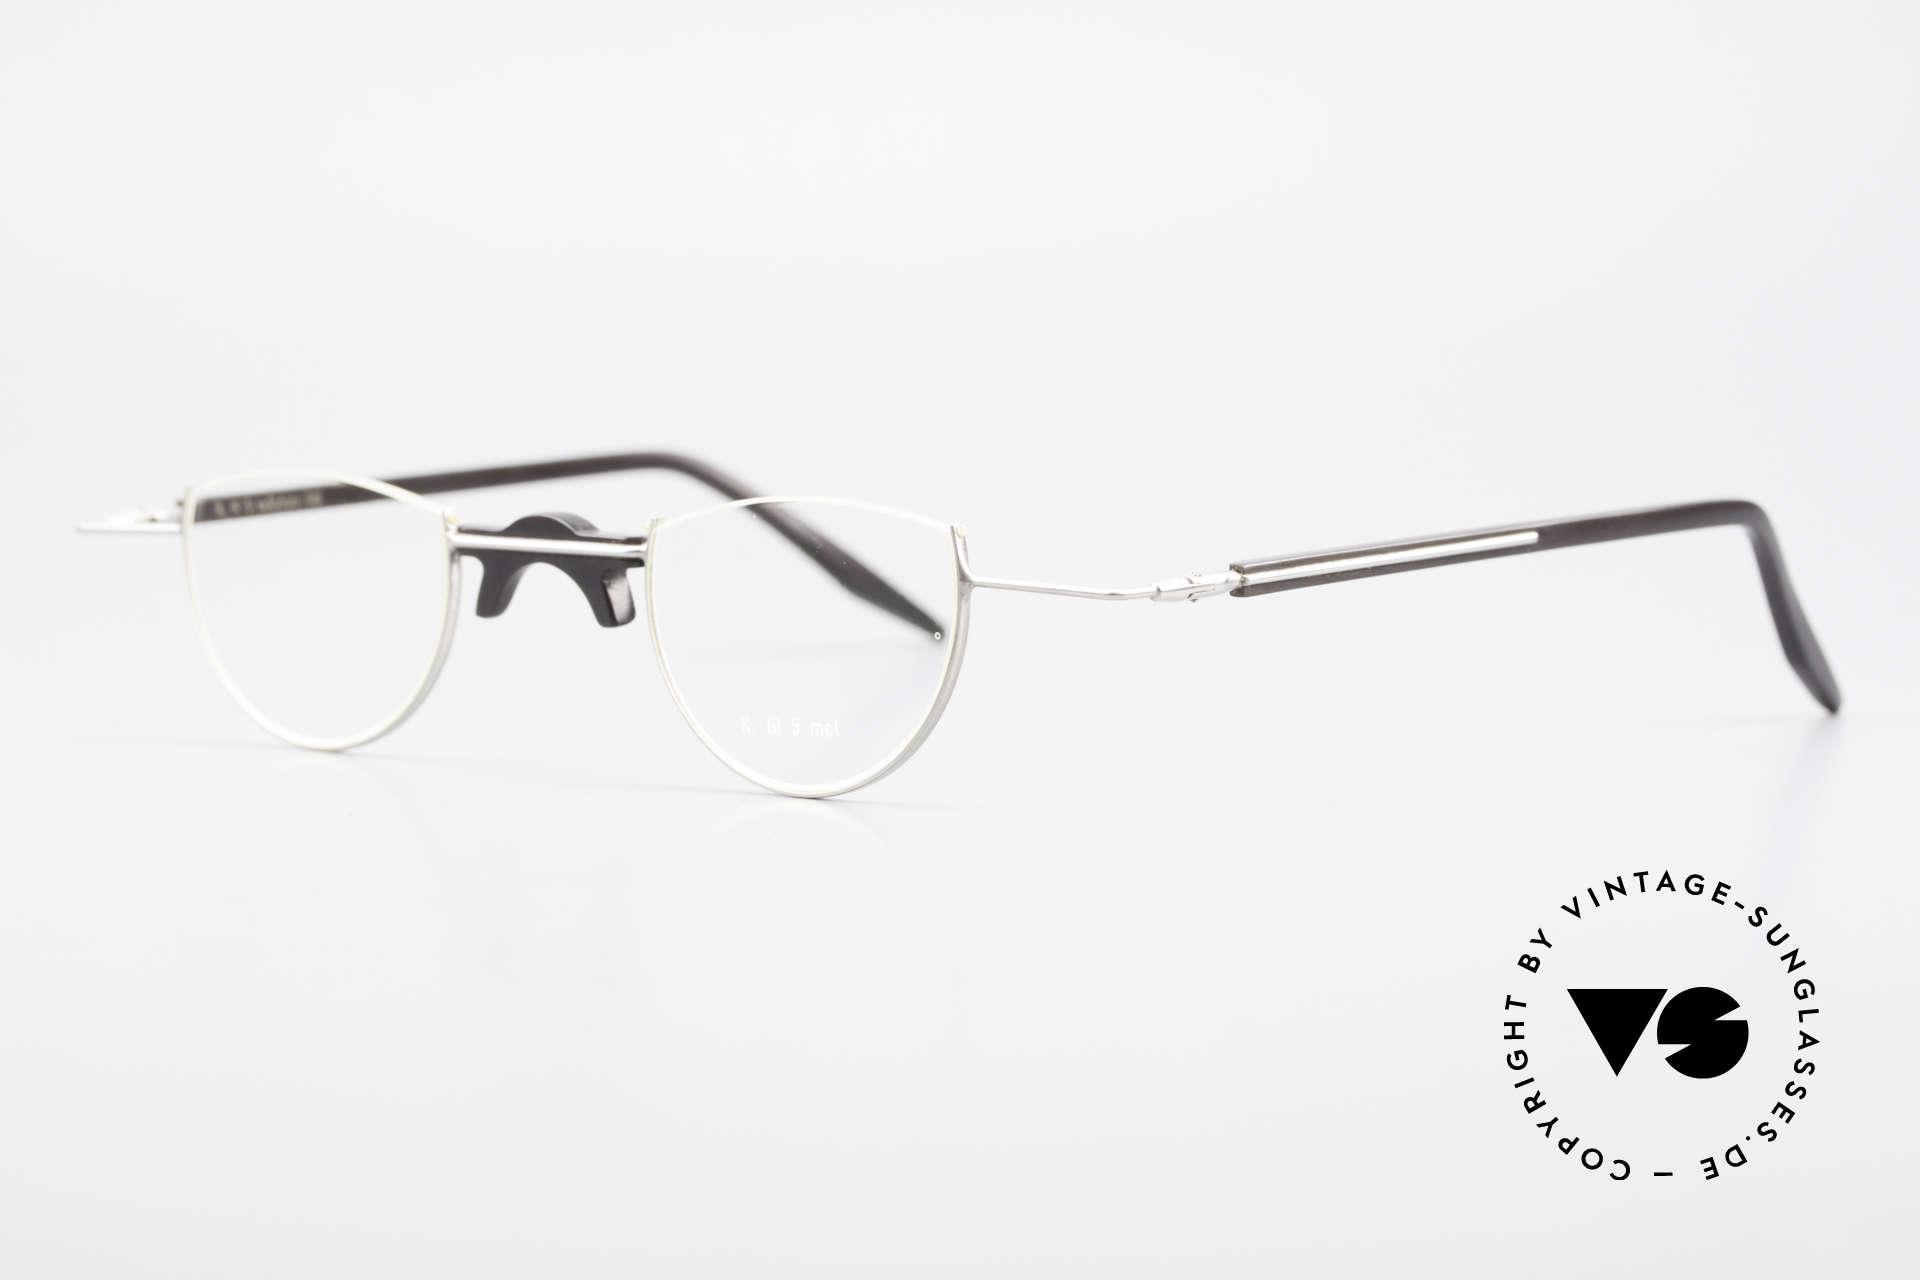 Wolfgang Katzer Fil 5 Genuine Horn Reading Glasses, 12g only, (pure natural material - handmade), vertu!, Made for Men